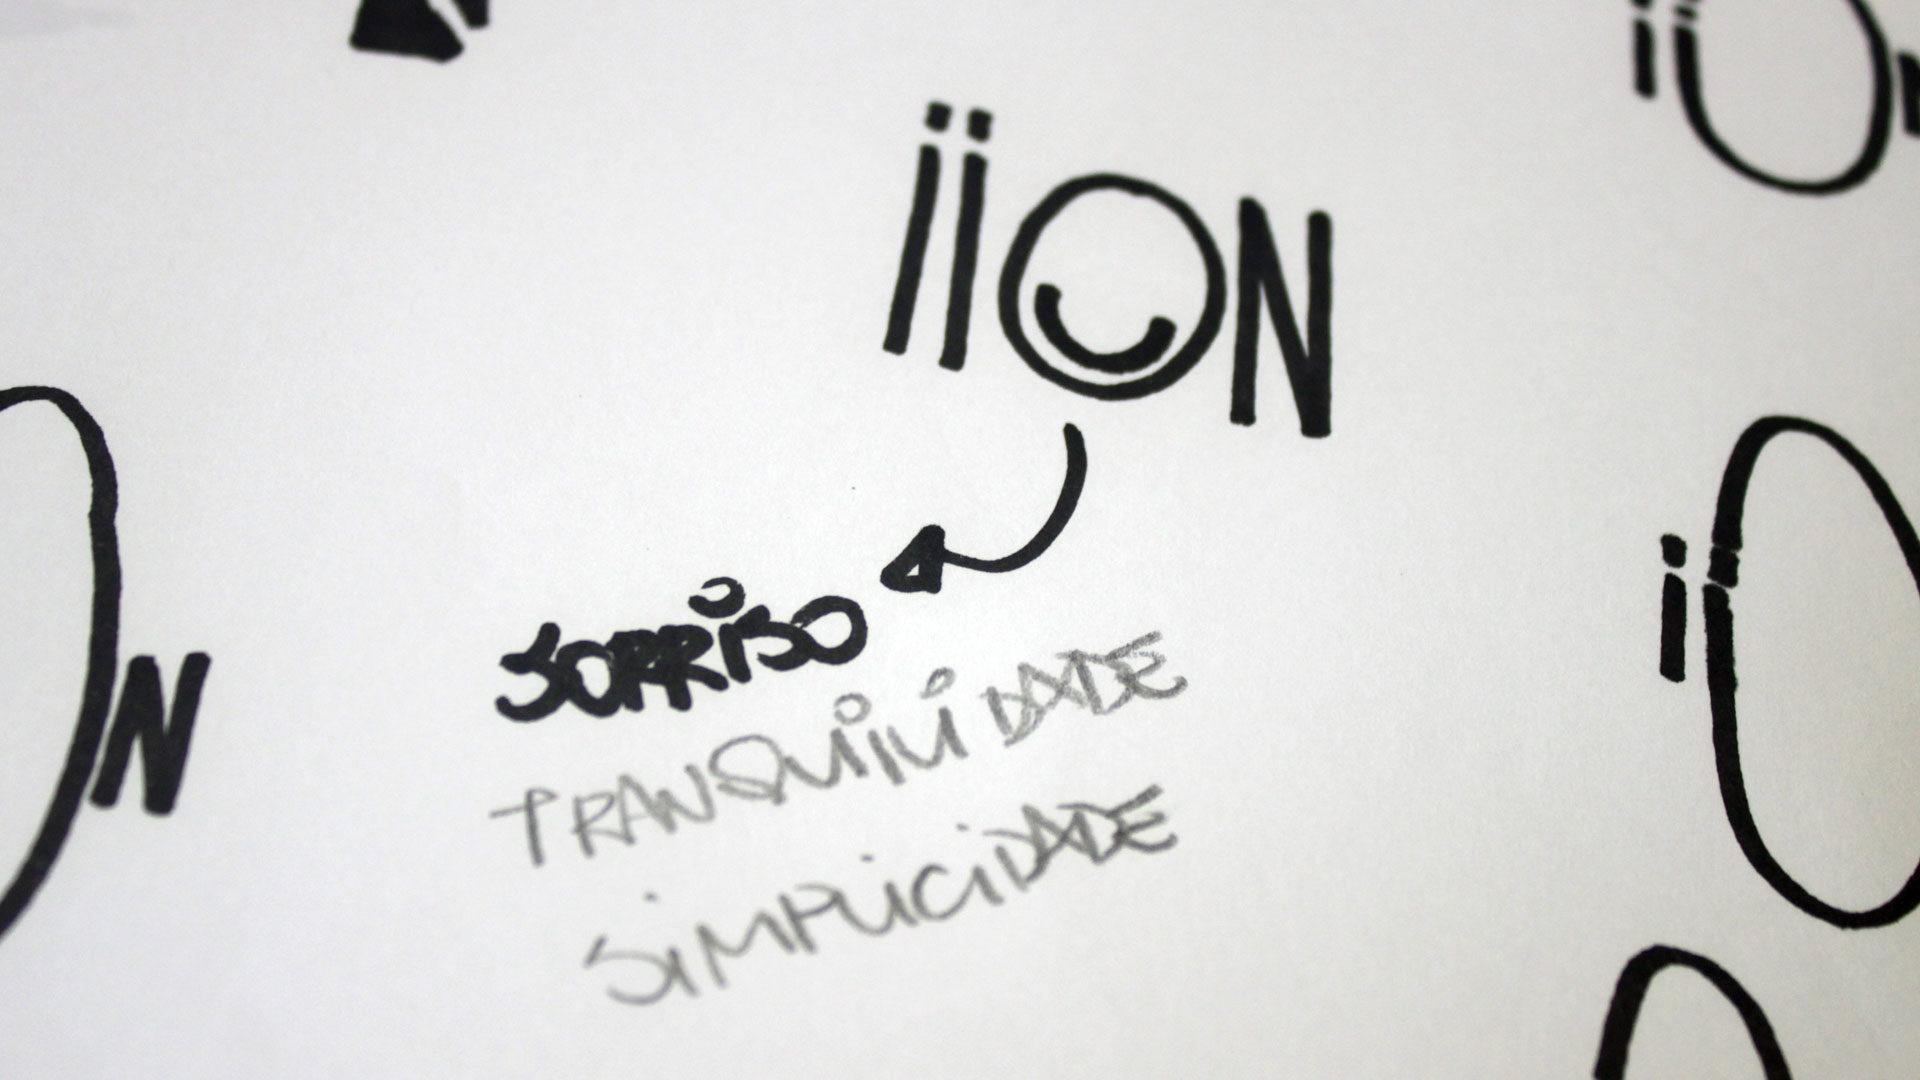 Projetos / iion 4